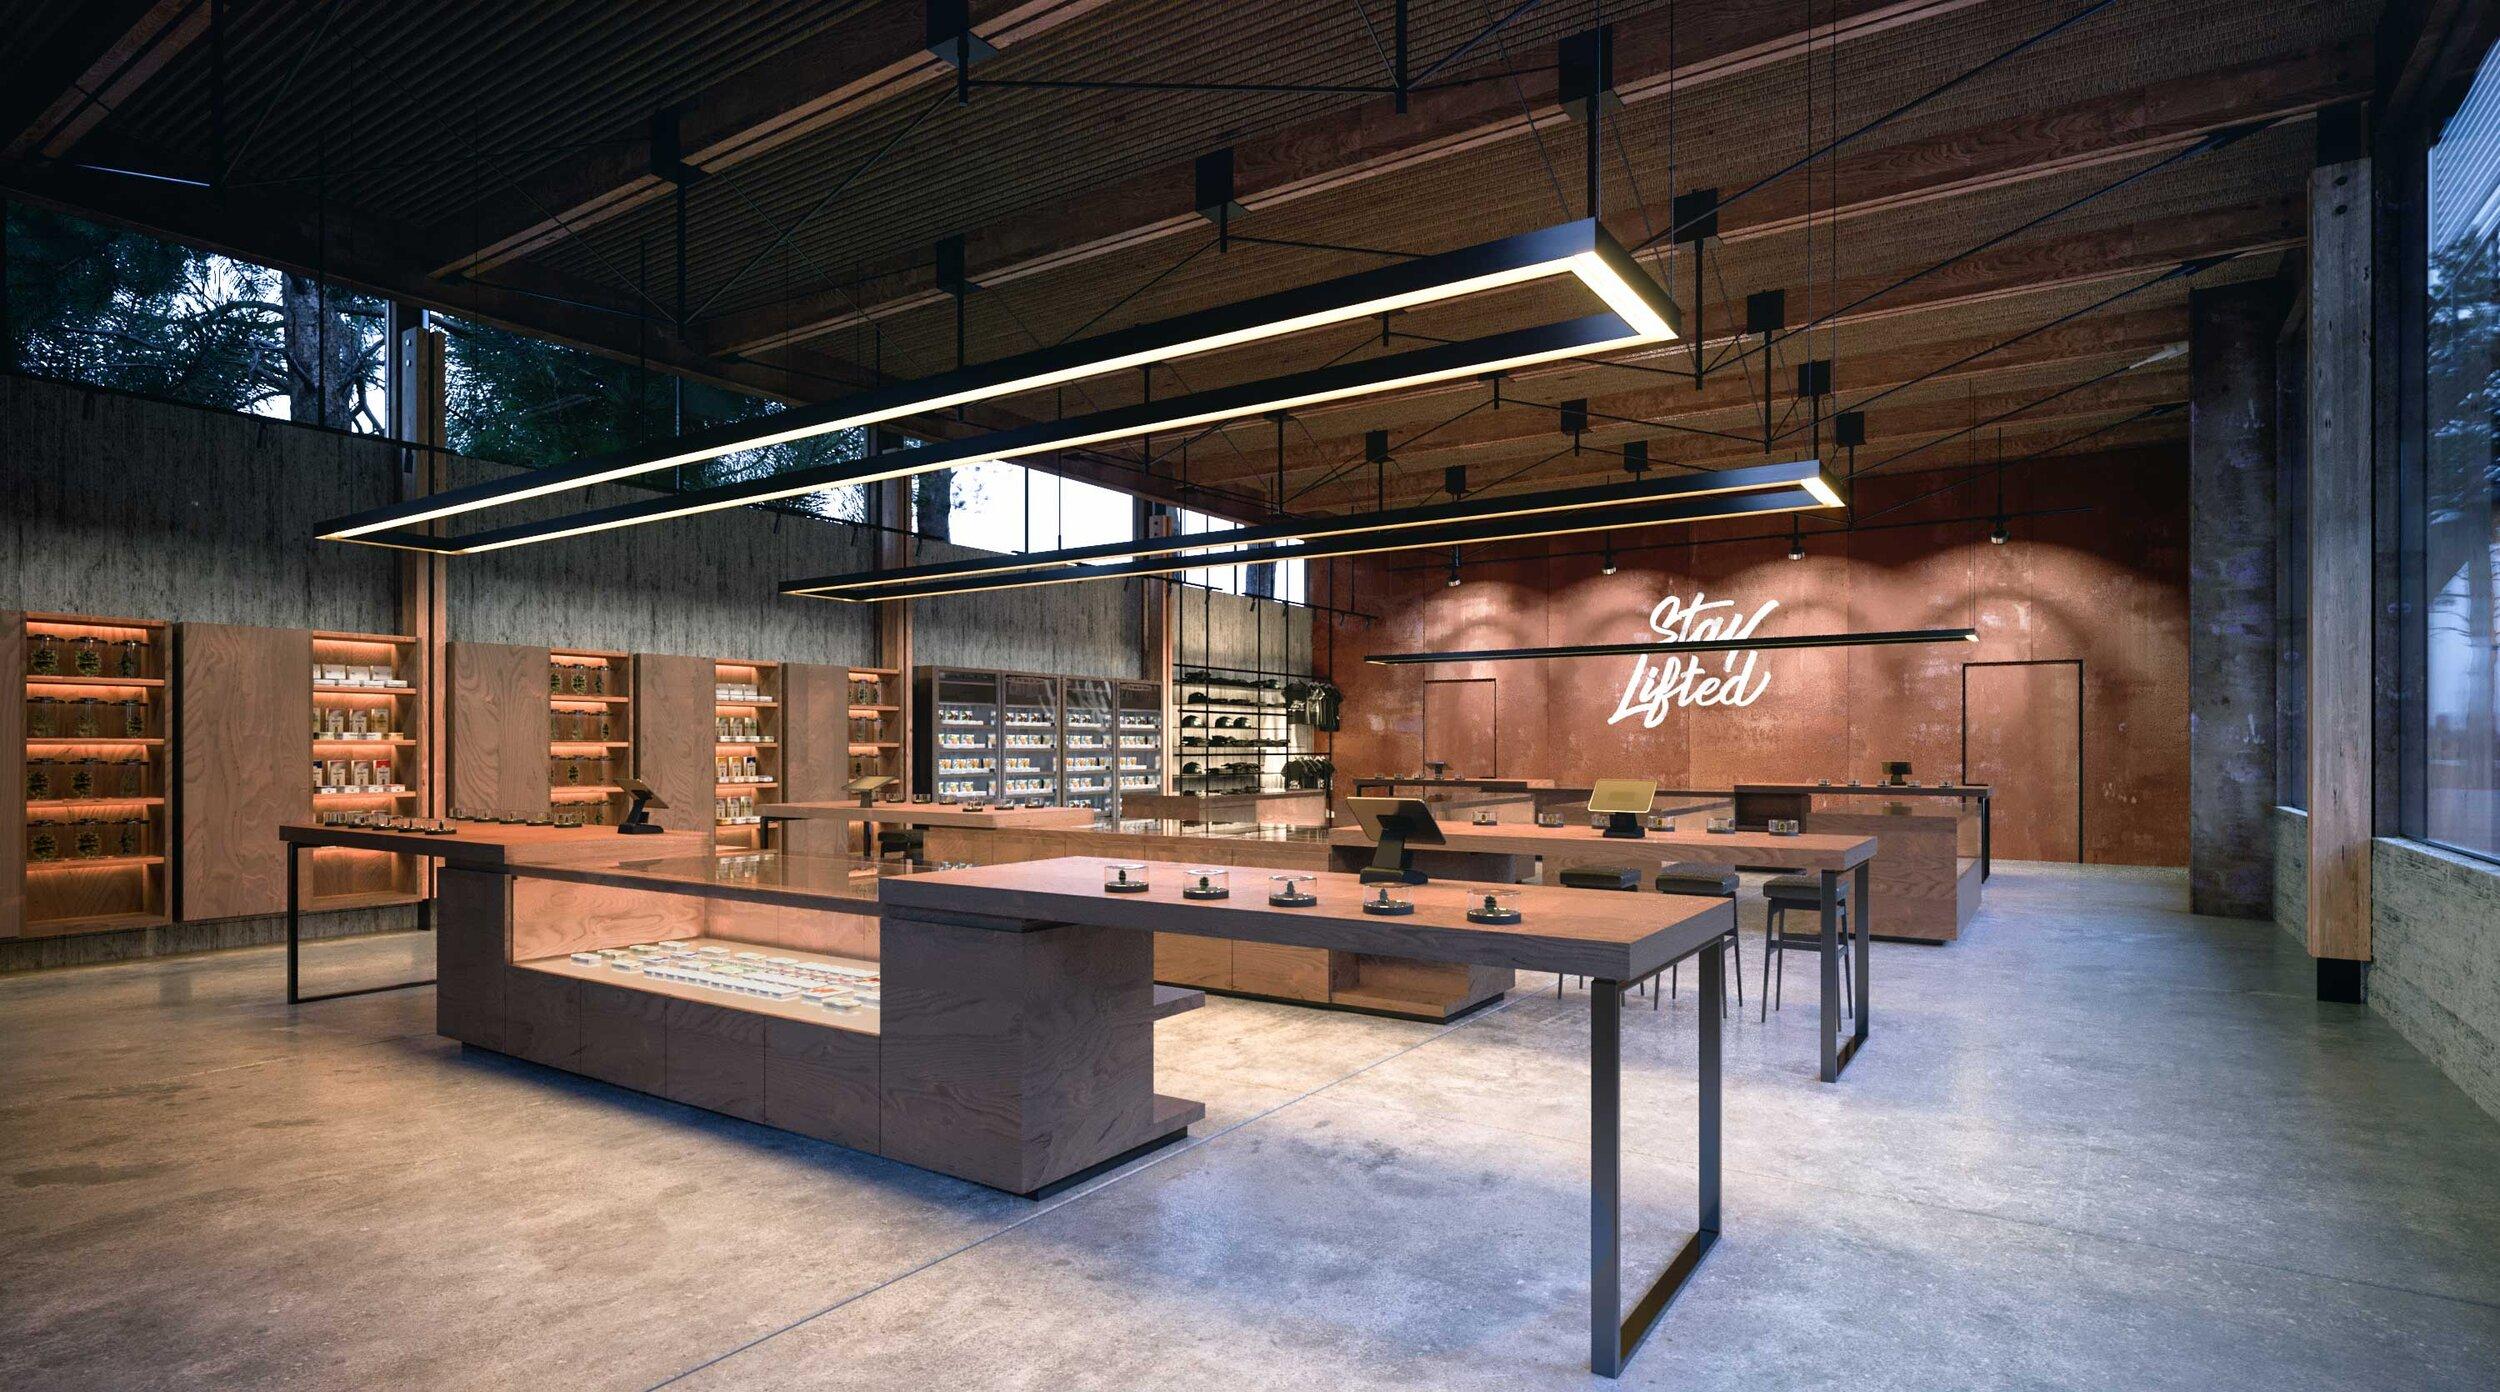 cannabis-retail-store-south-lake-tahoe-archillusion-design-03.jpg